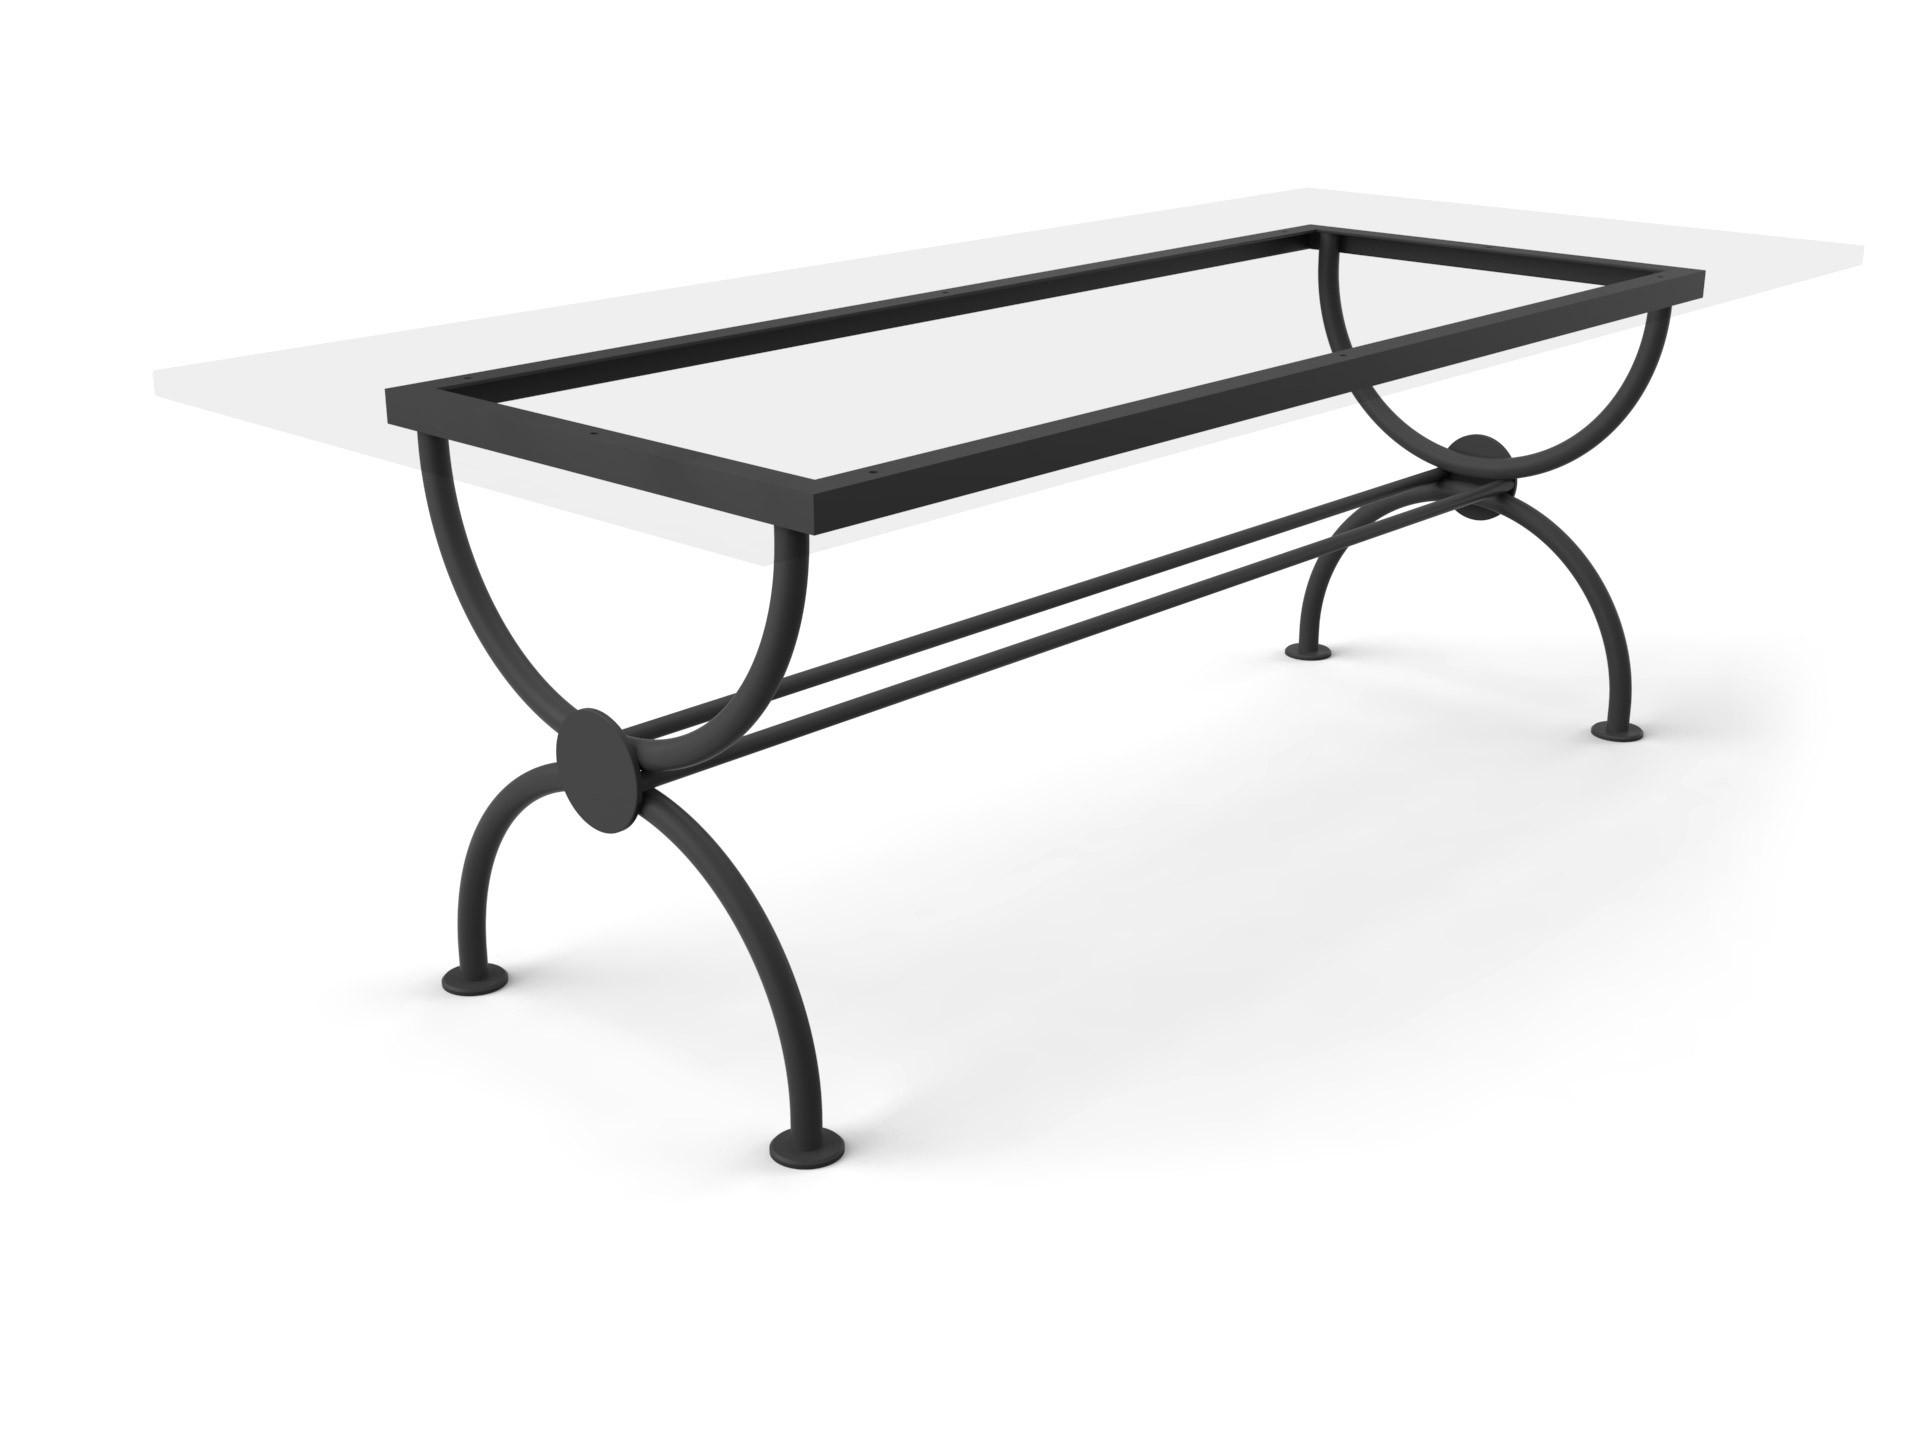 Tischgestell Rondo